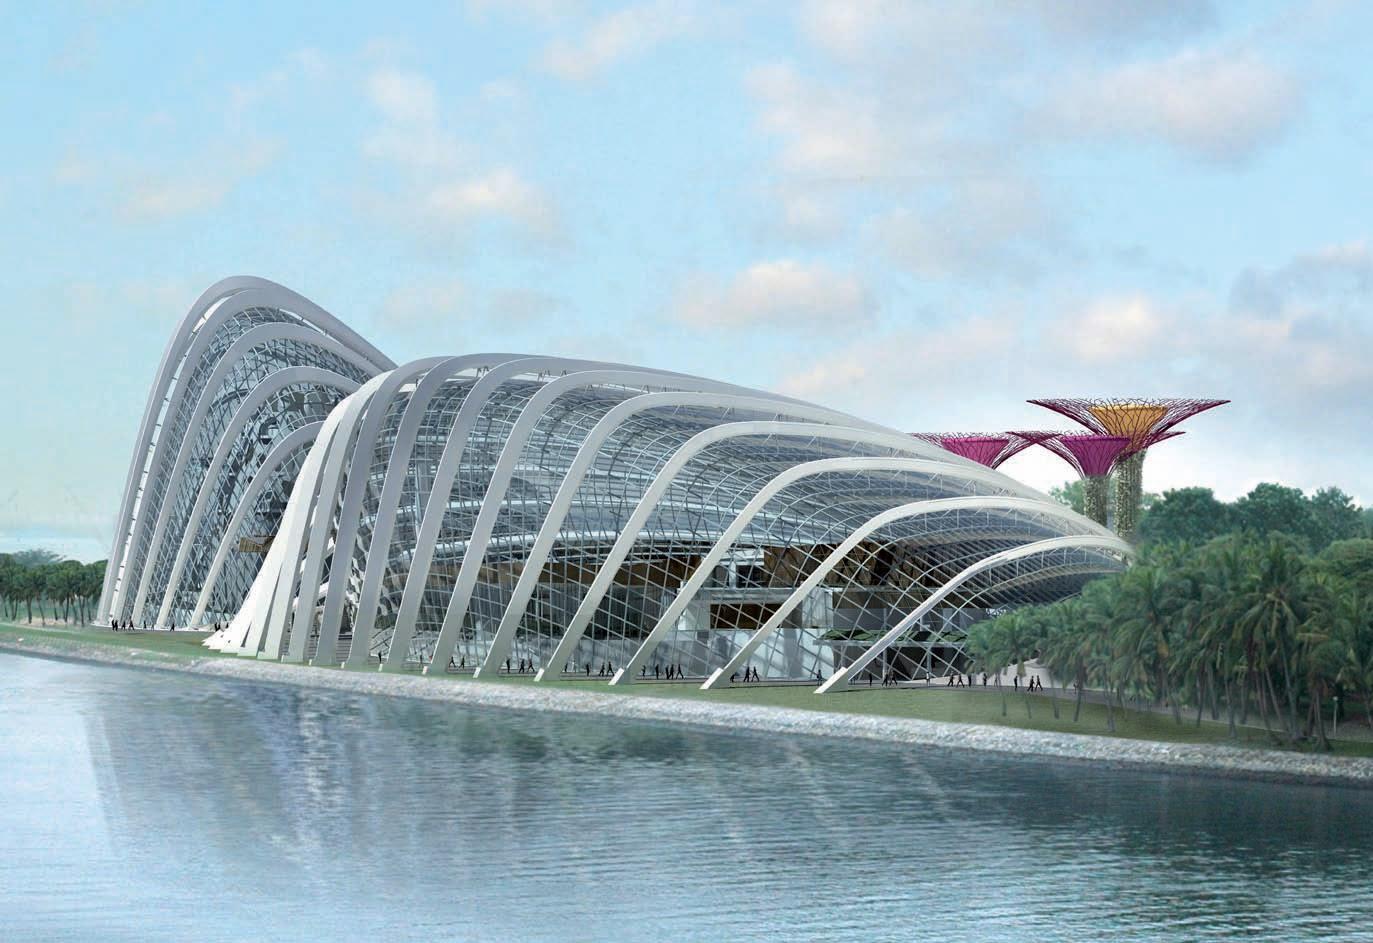 The Hypothetical Australian Capital City 038 Exemplar Gardens By The Bay Singapore